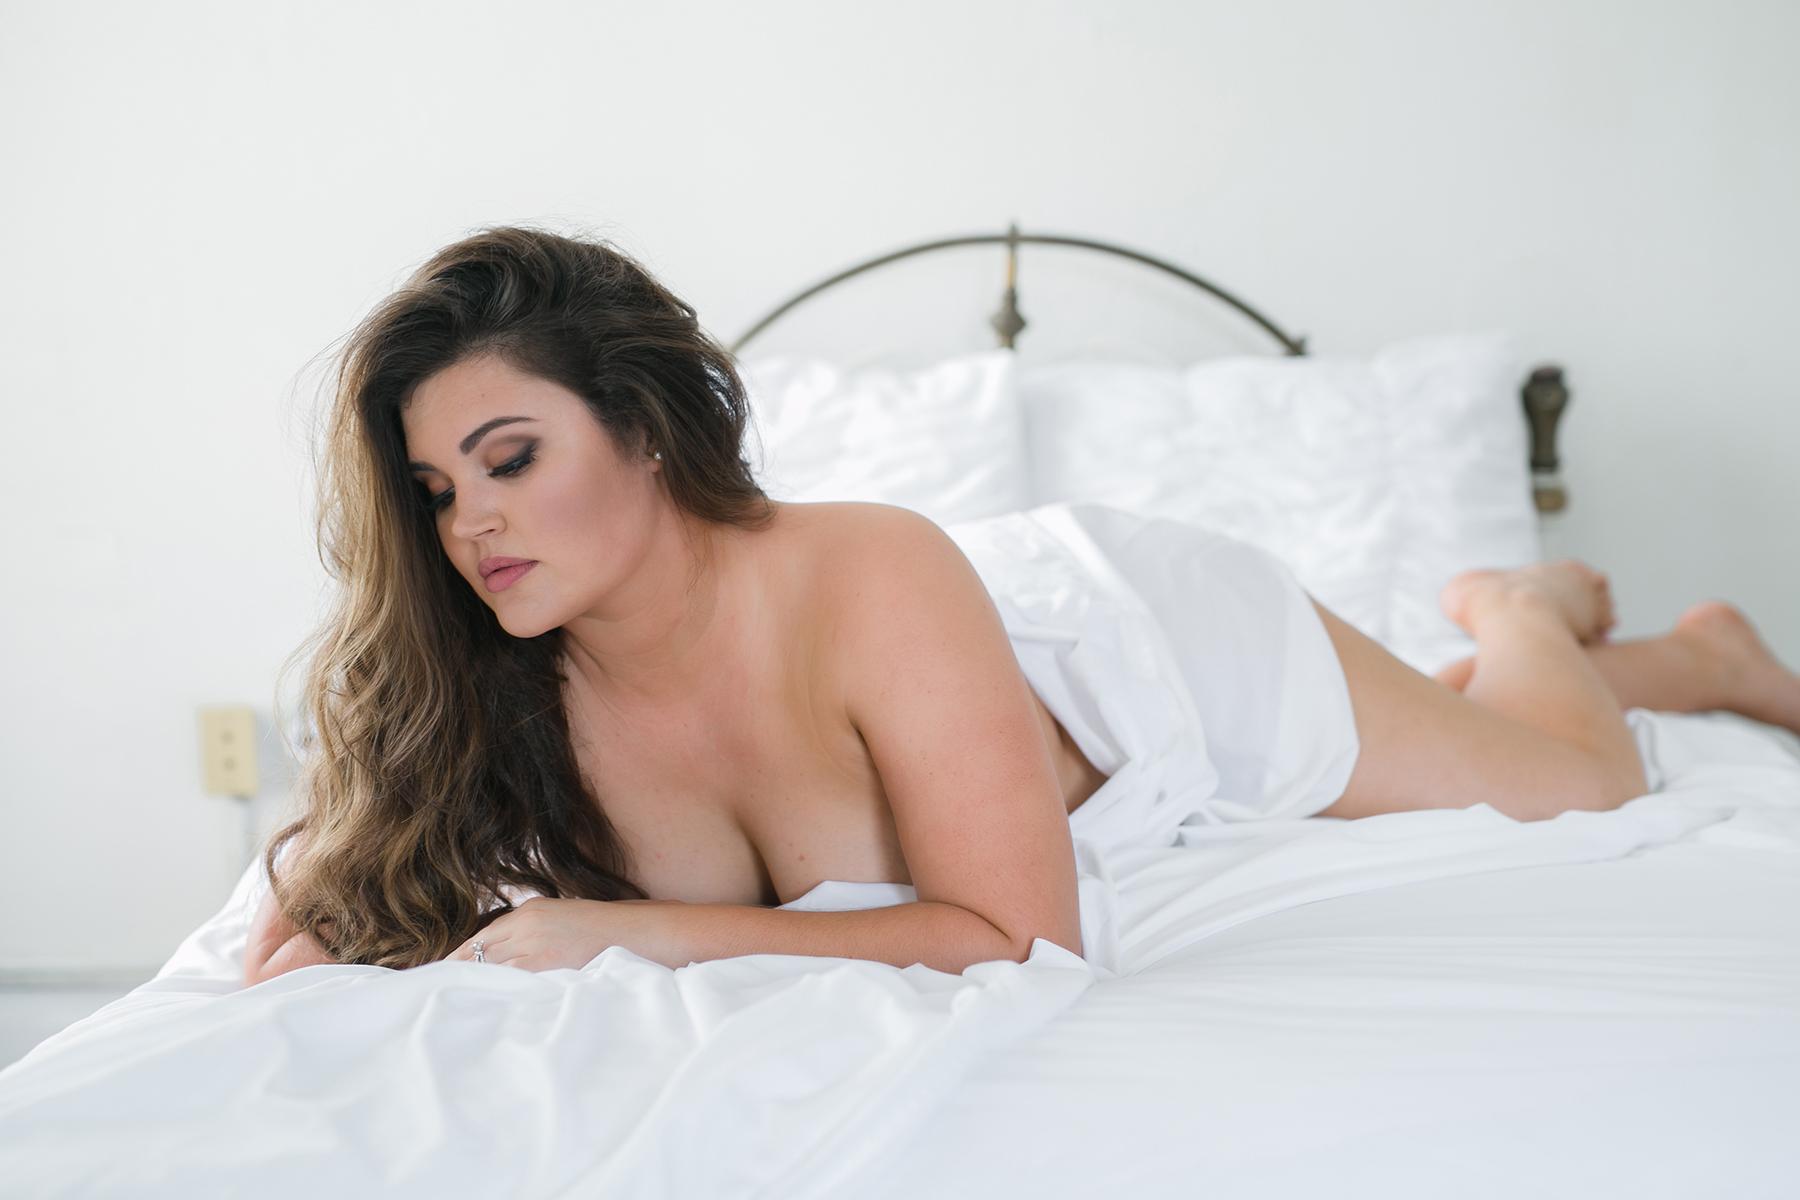 austin-tx-boudoir-photographer-photography-kimberly-brooke-25.jpg